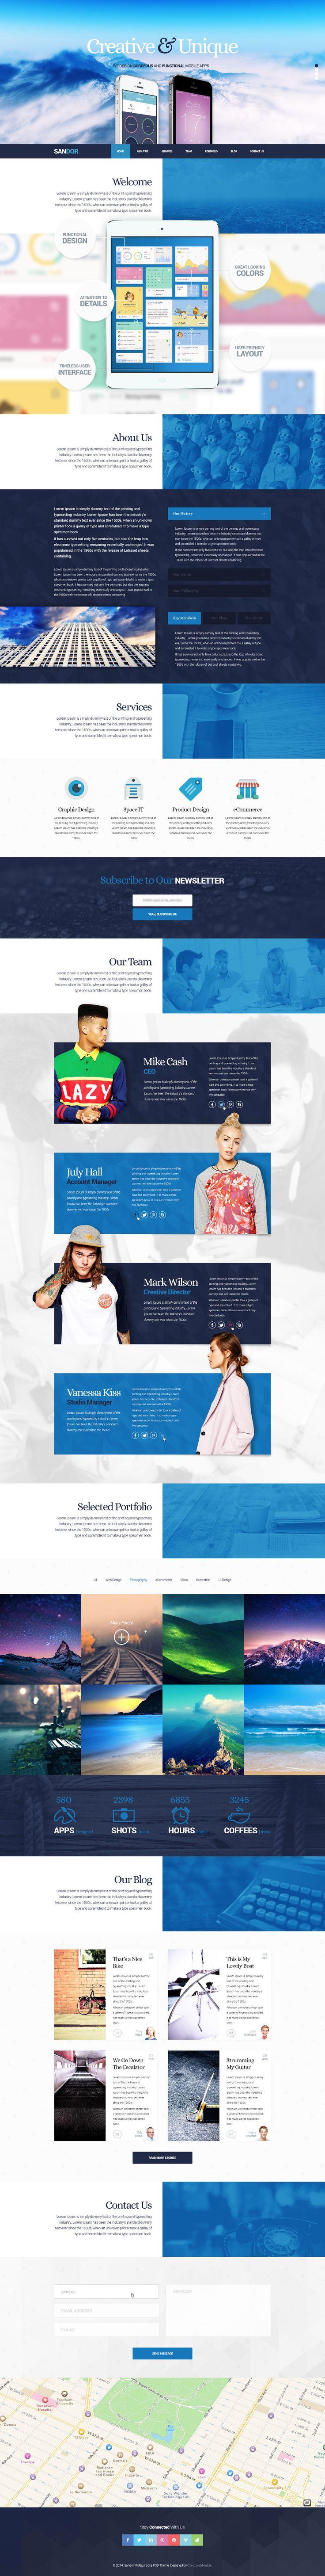 SANDOR Creative Portfolio WordPress Theme on Behance